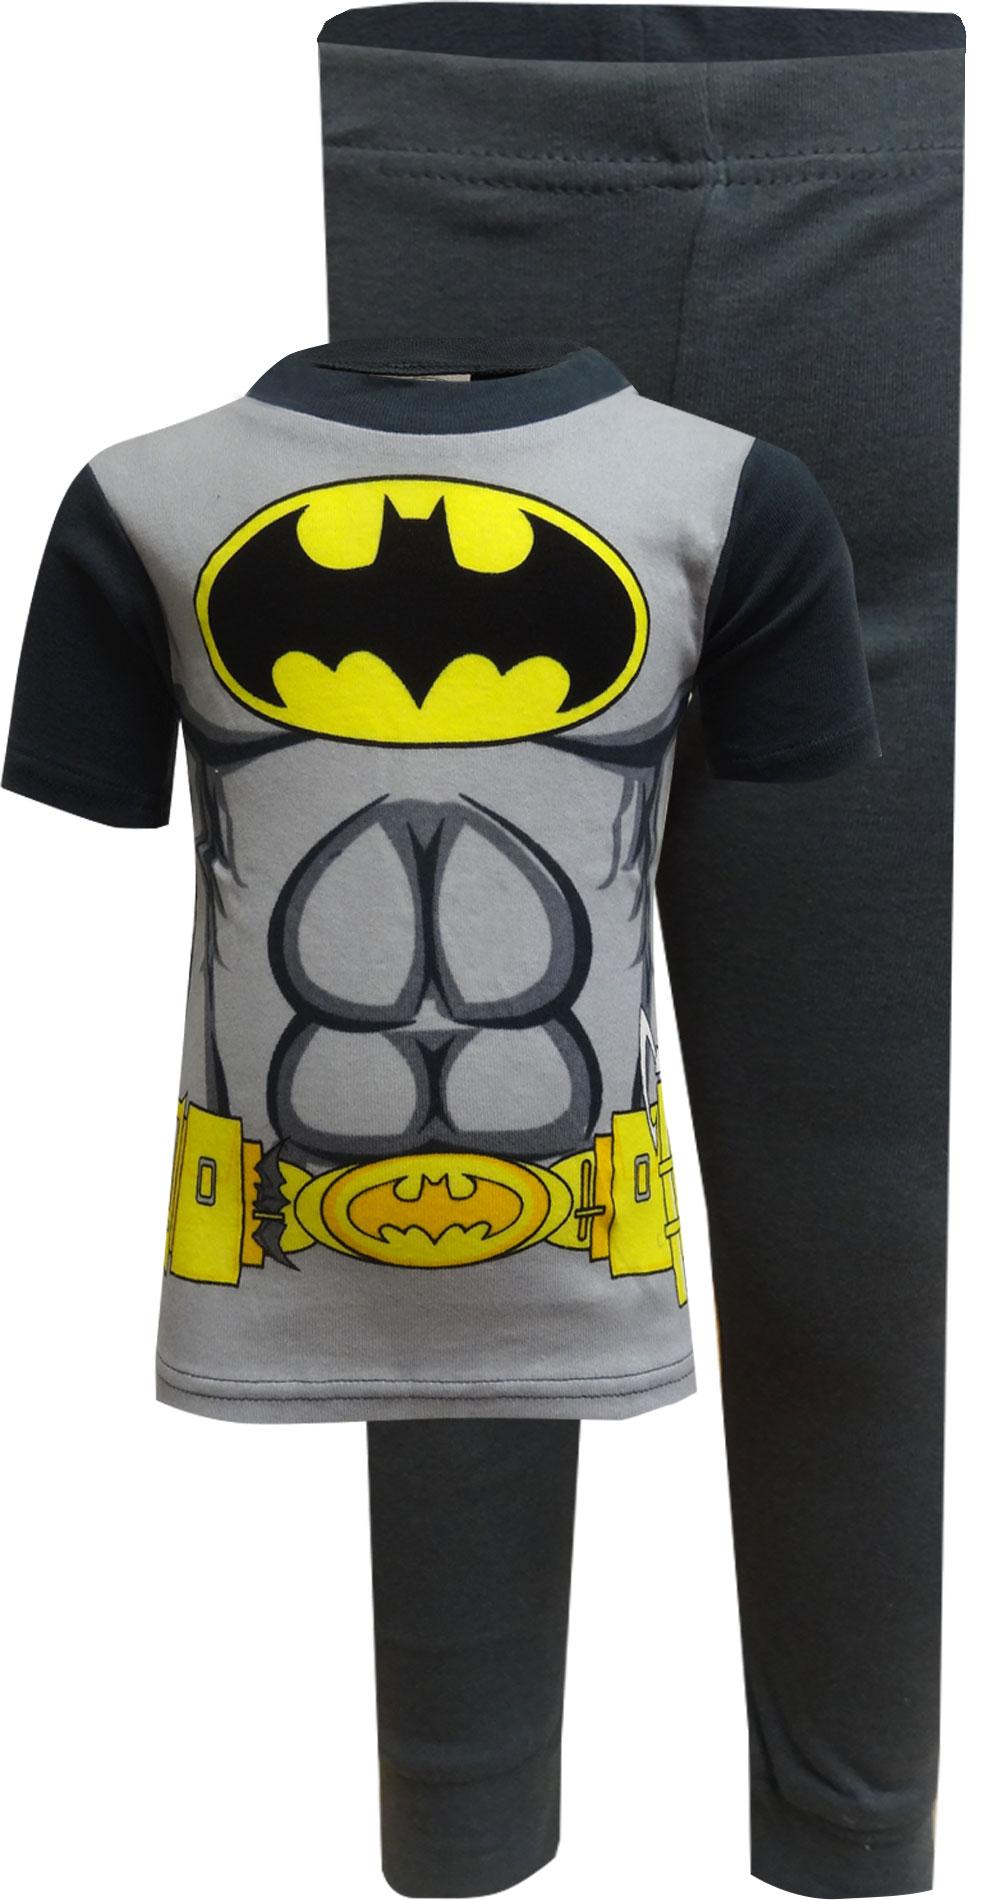 Image of Batman Super Abs Pajama for Boys for boys